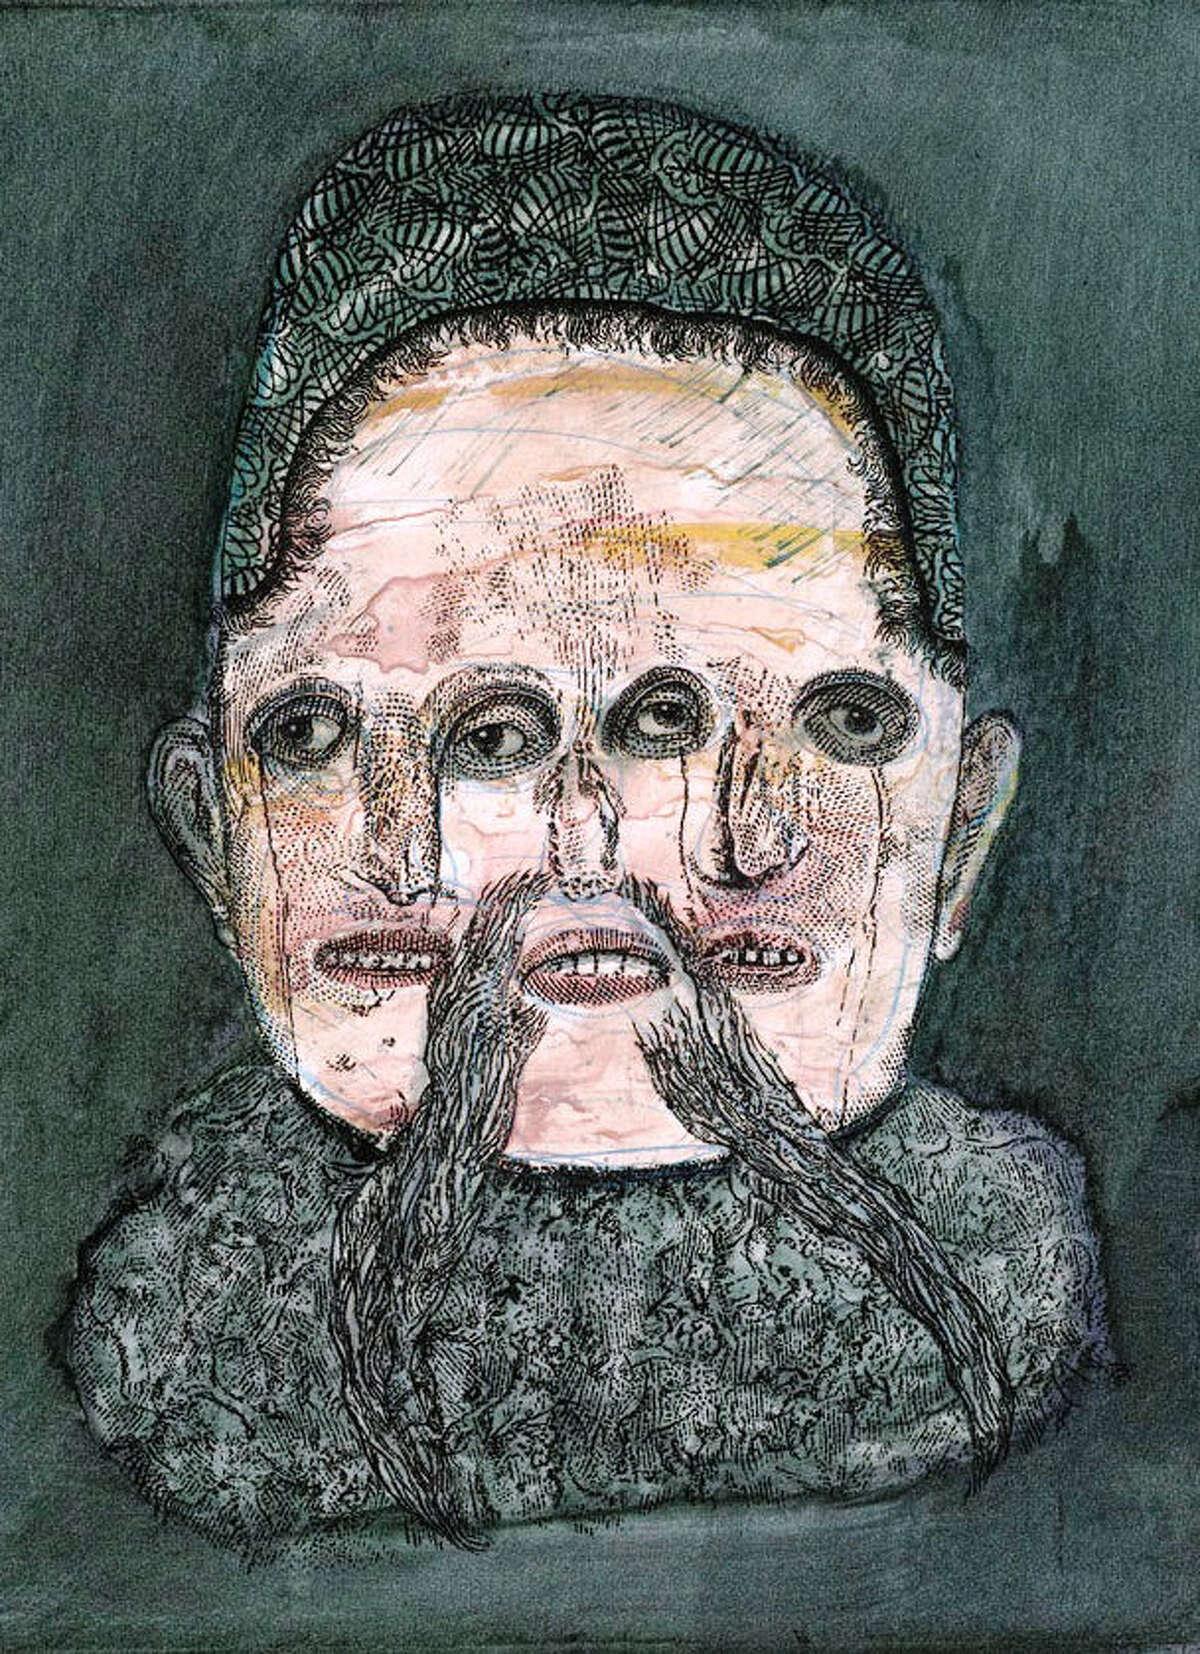 The impartial, three-faced